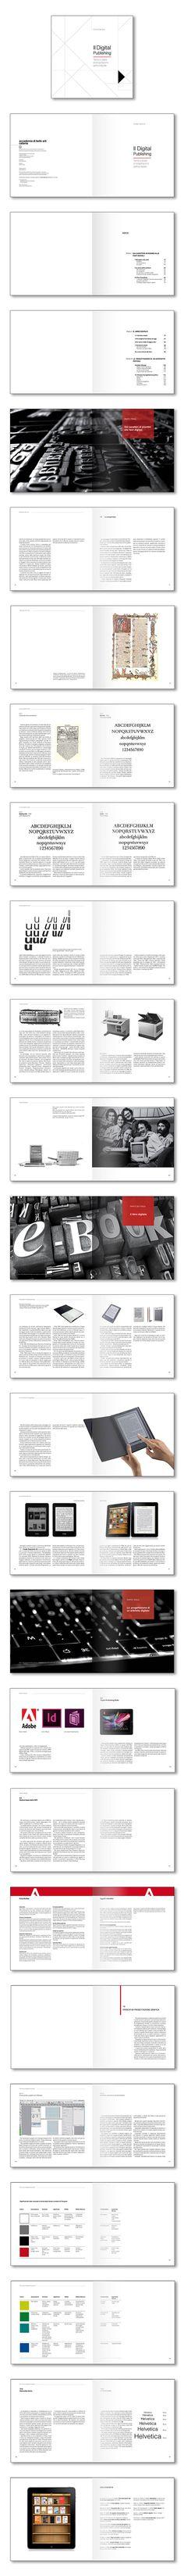 Il Digital Publishing on Behance